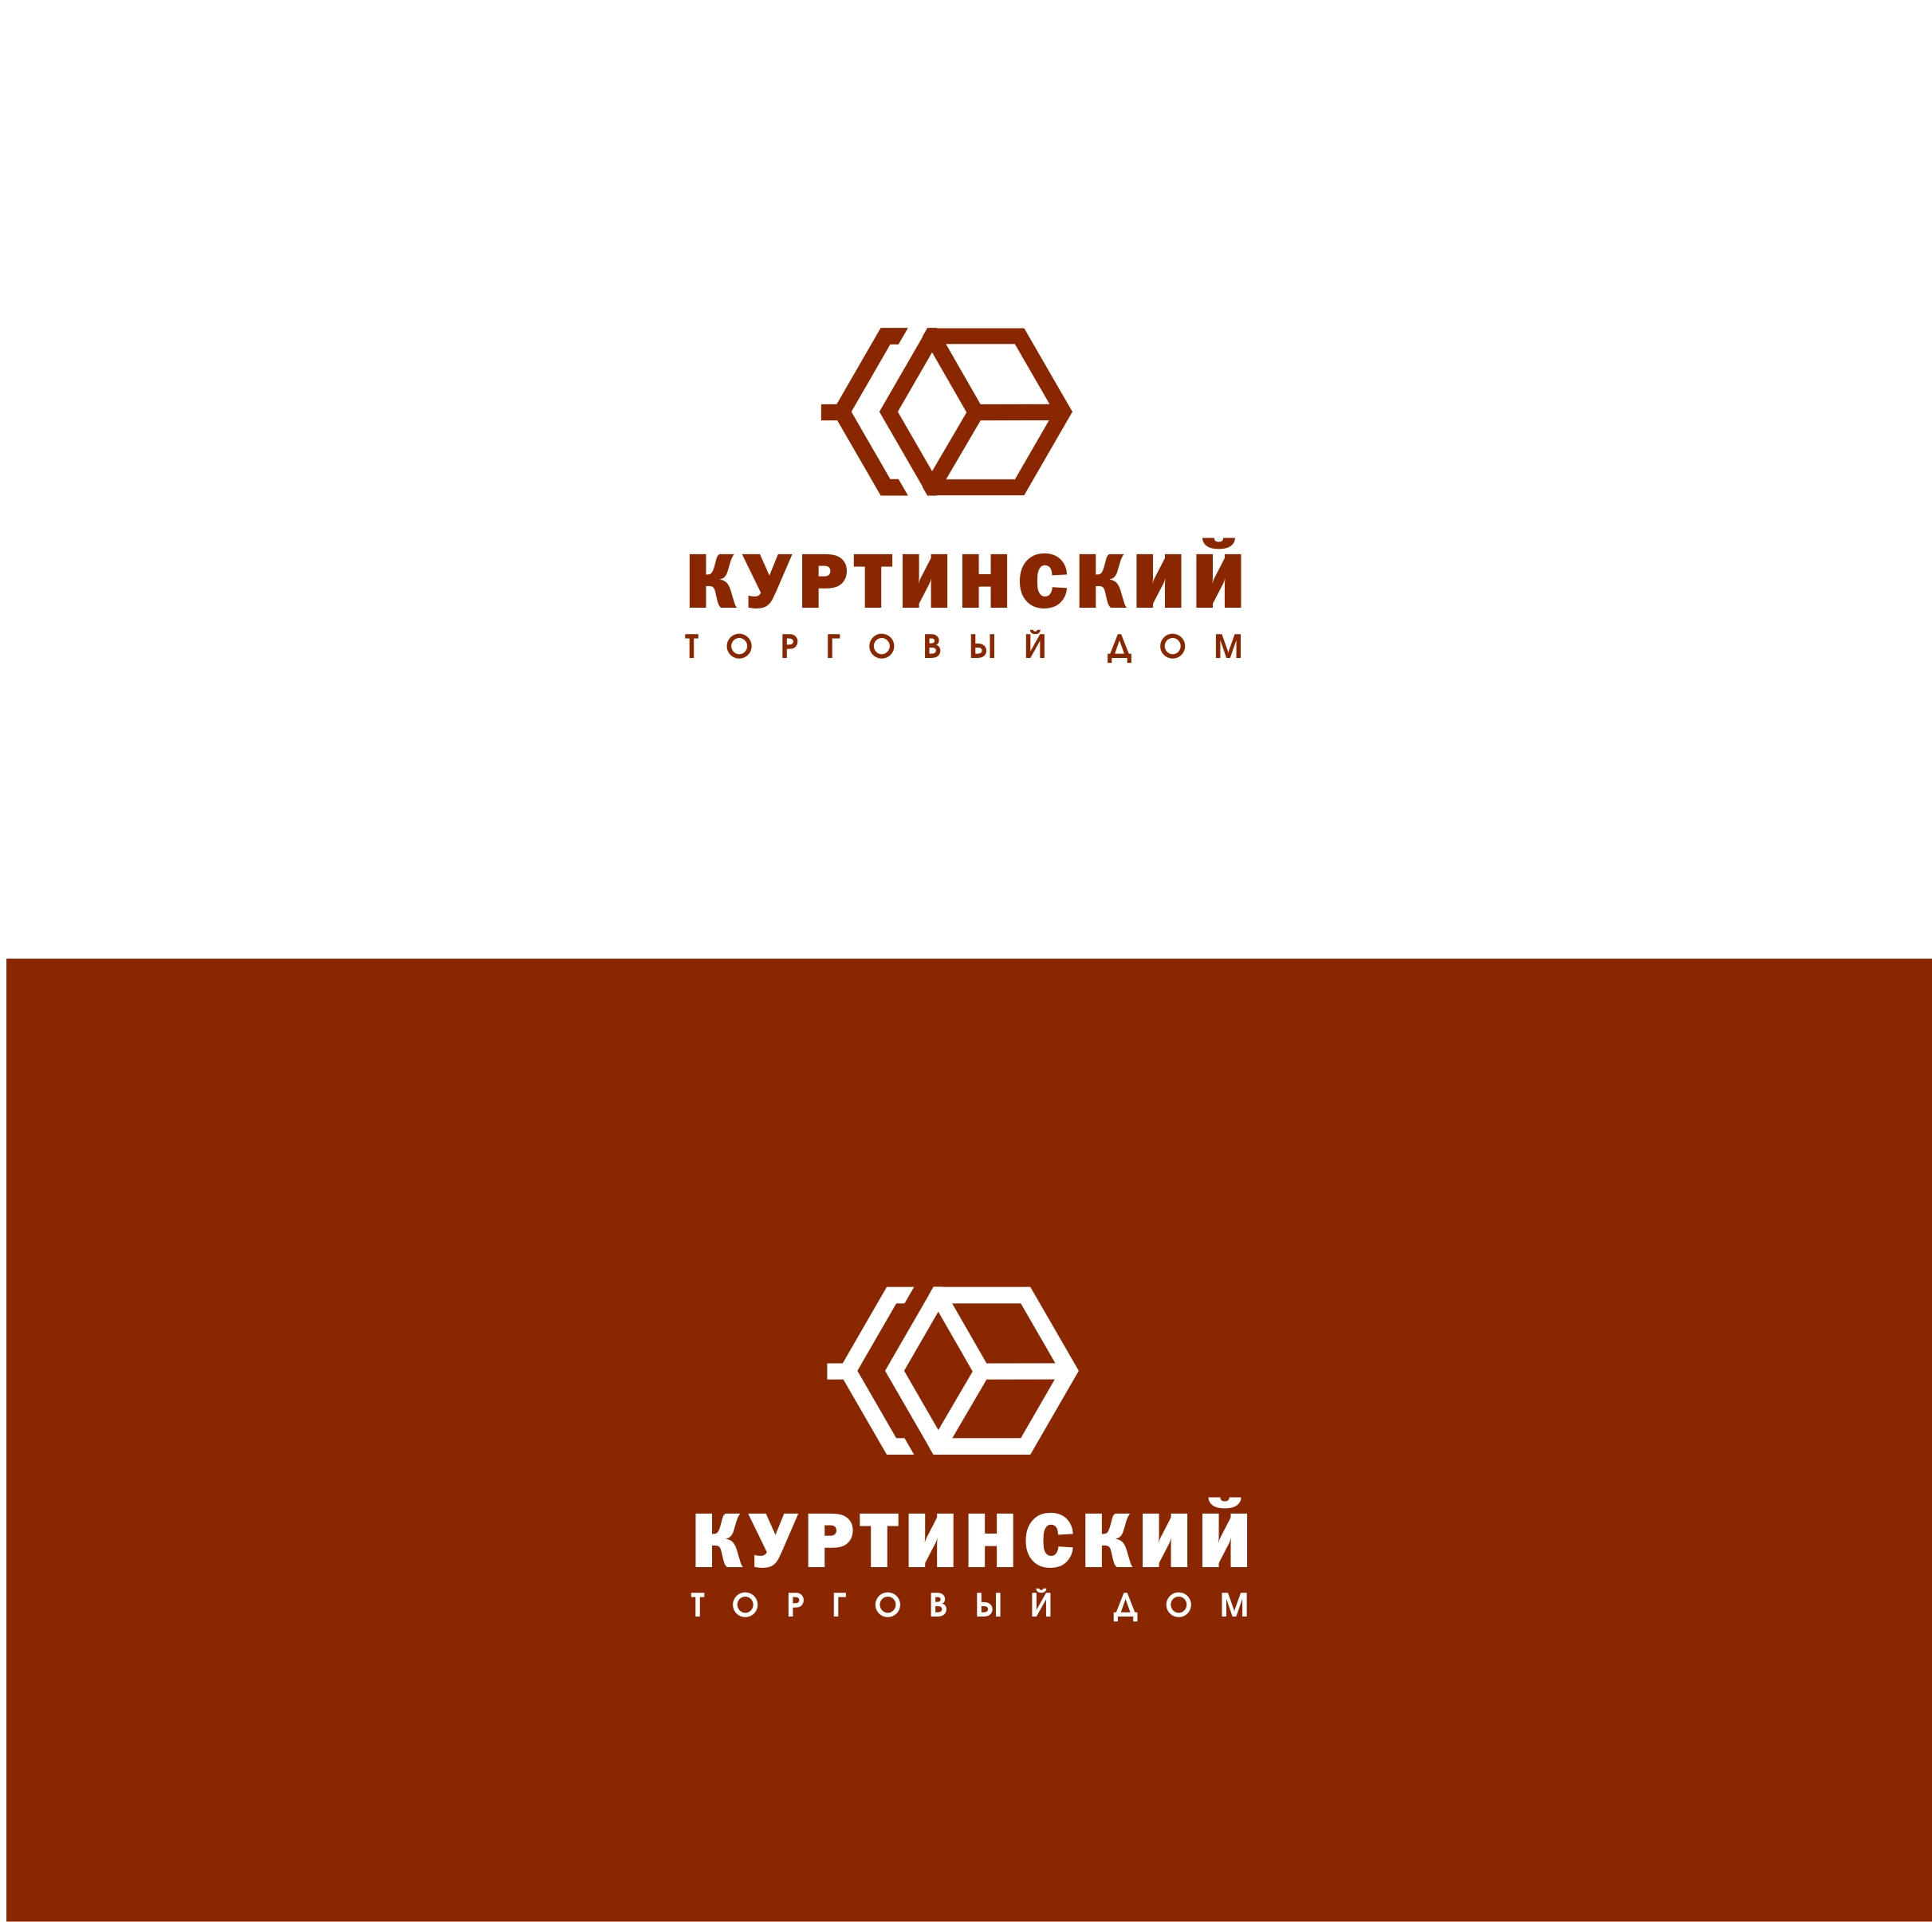 Логотип для камнедобывающей компании фото f_0995b9a4f30ba937.jpg